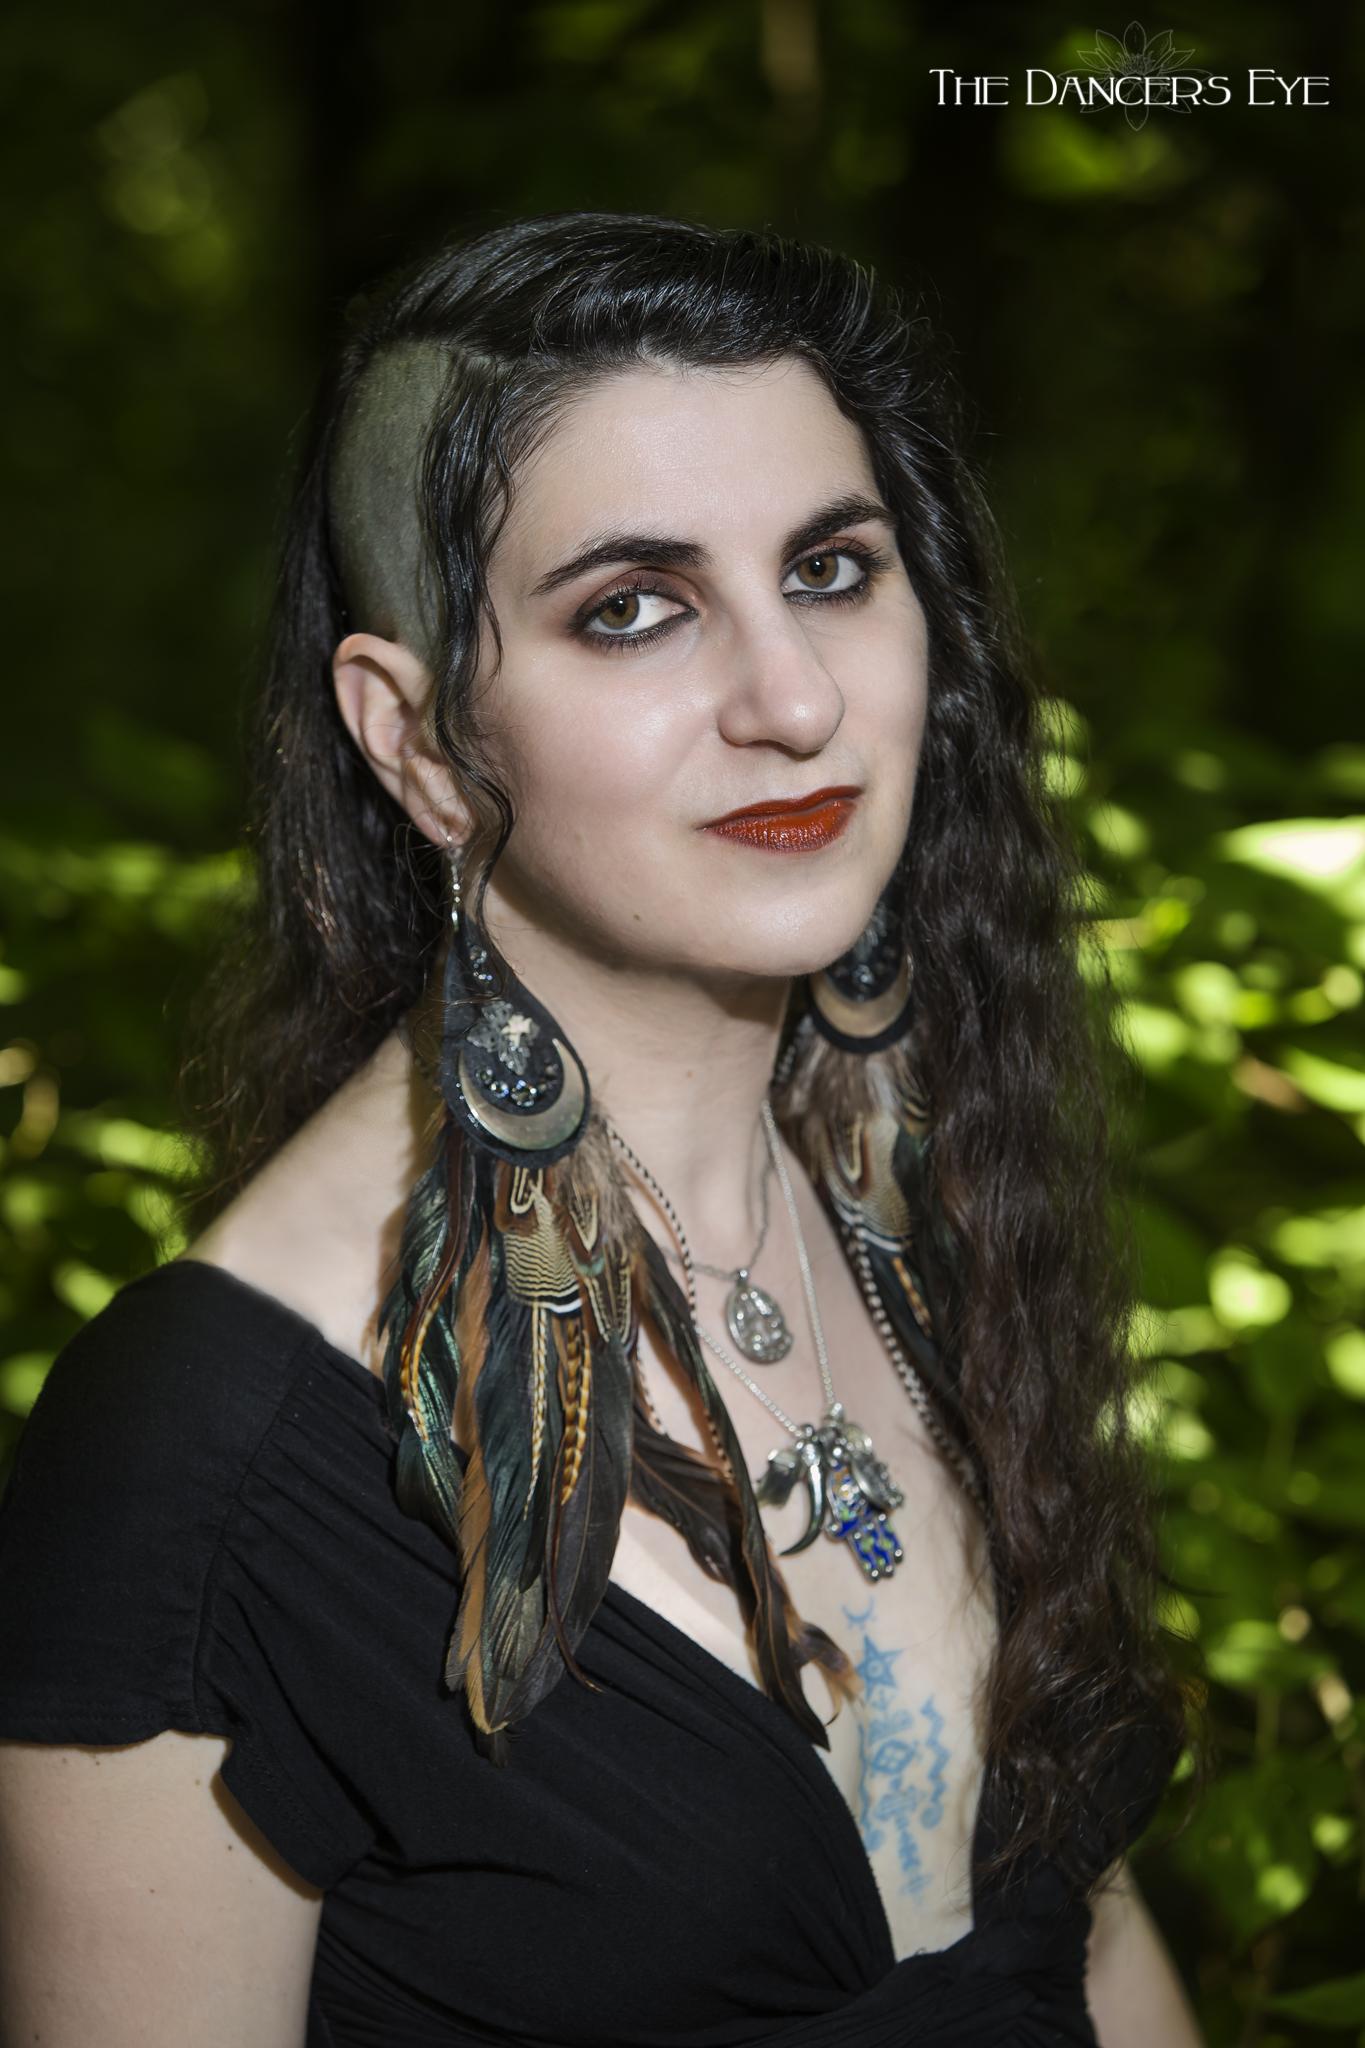 Laura Tempest Zakroff